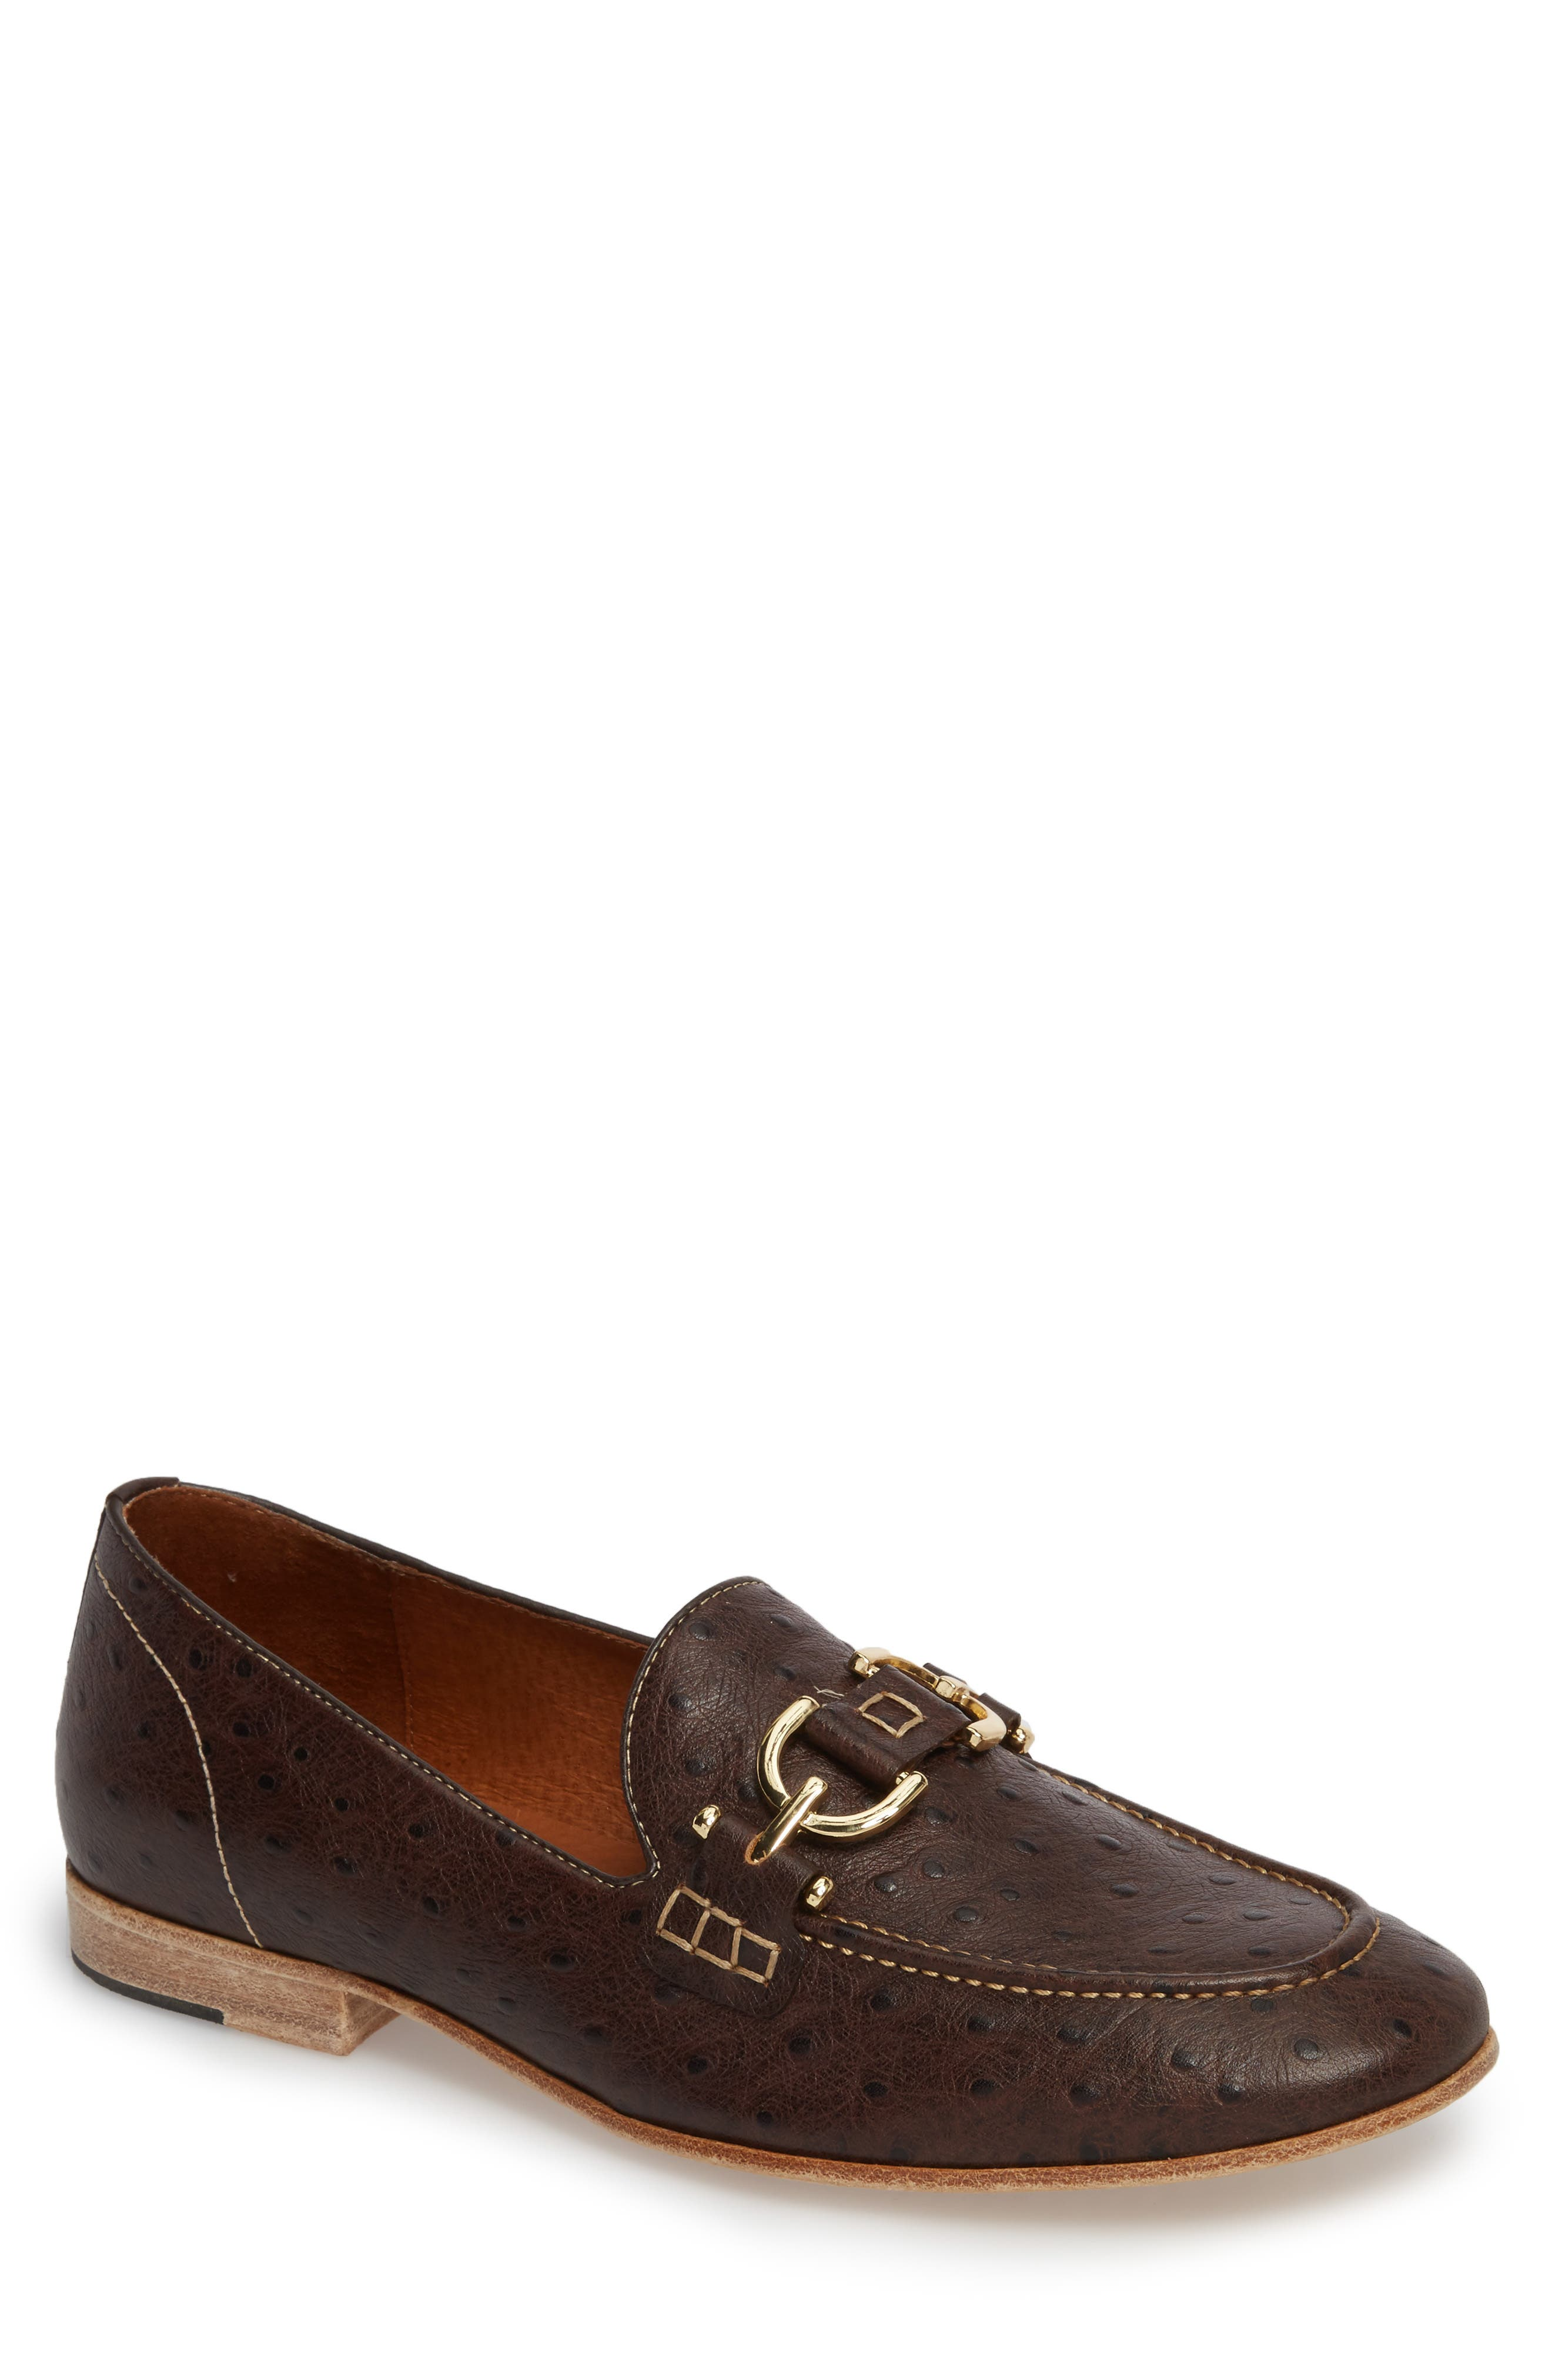 Moritz Apron Toe Bit Loafer,                             Main thumbnail 1, color,                             Brown Leather